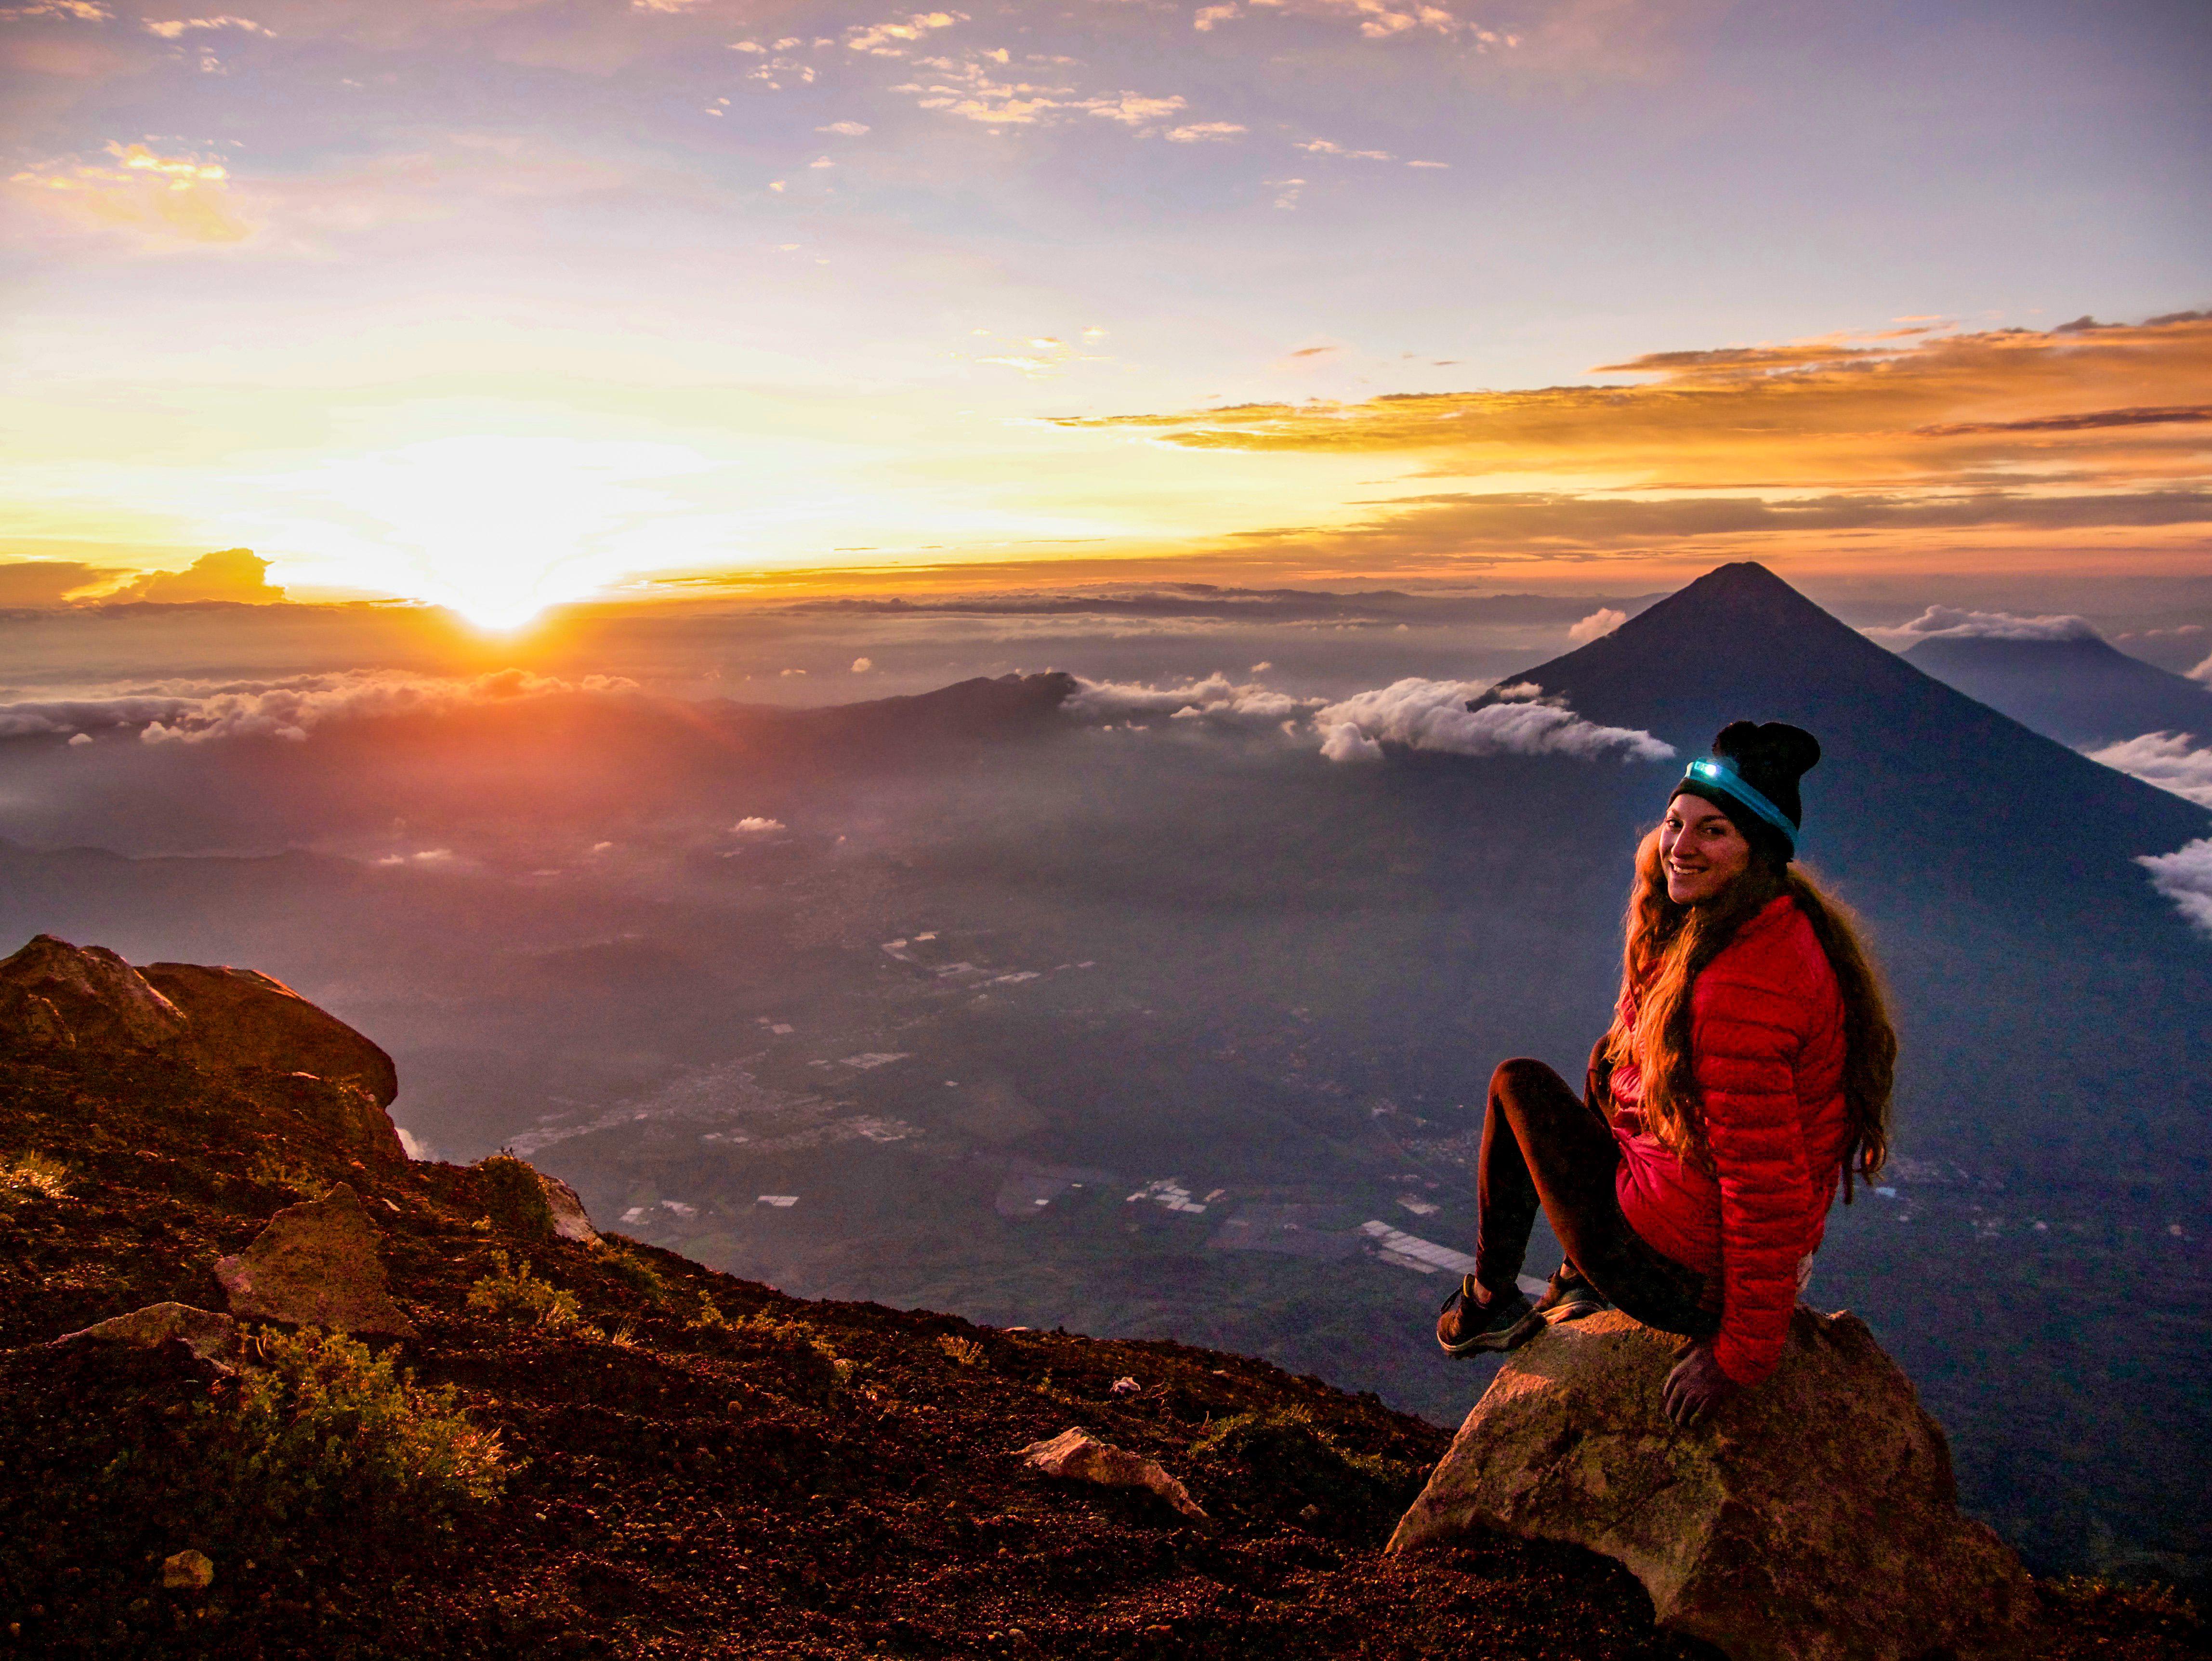 Sunrise Acatenango Volcano overlooking Agua Volcano